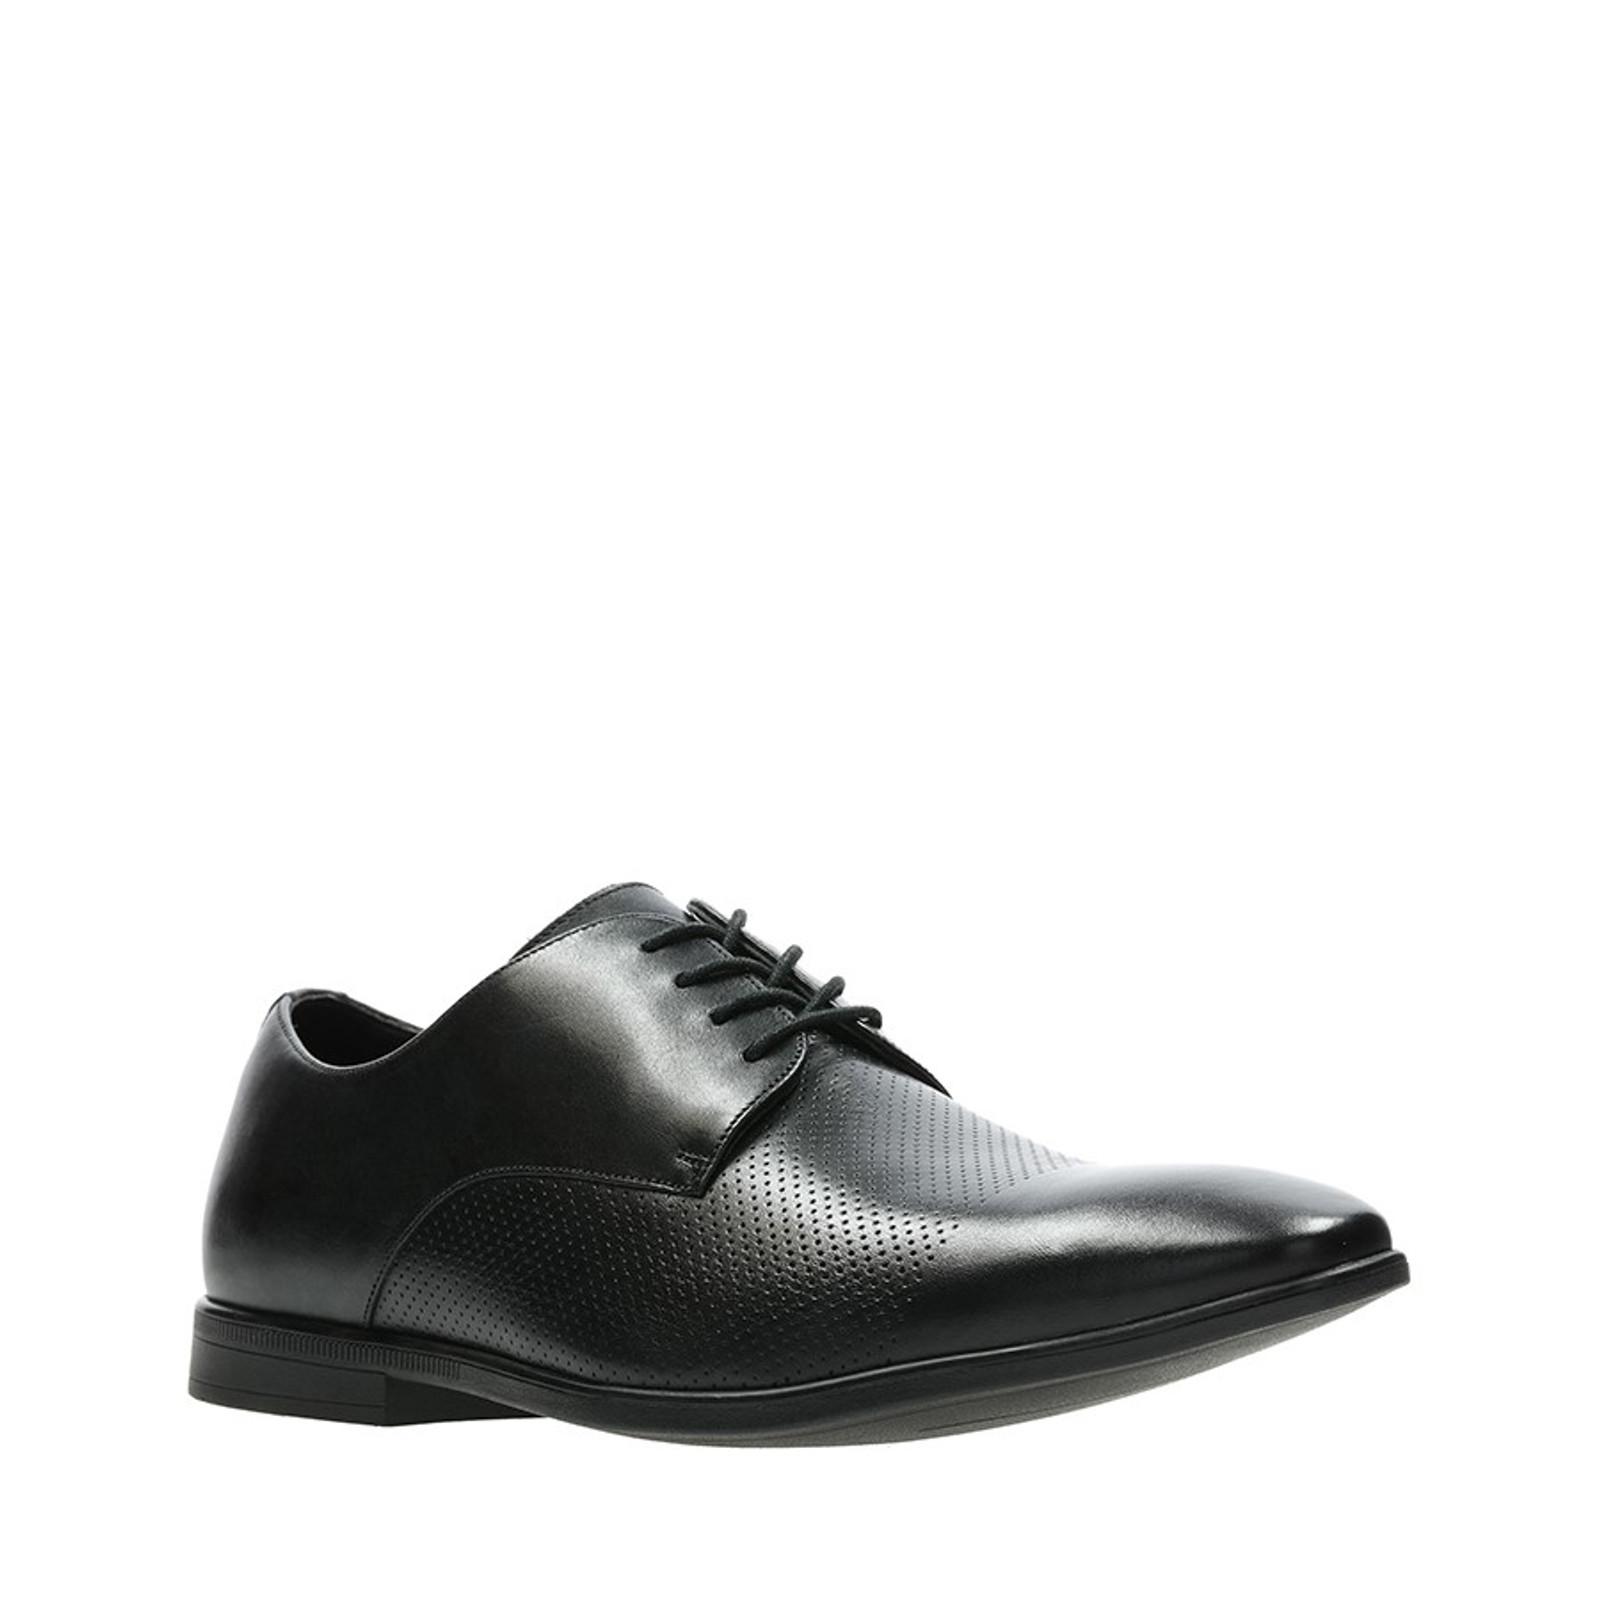 Bampton Cap Black Leather By Clarks